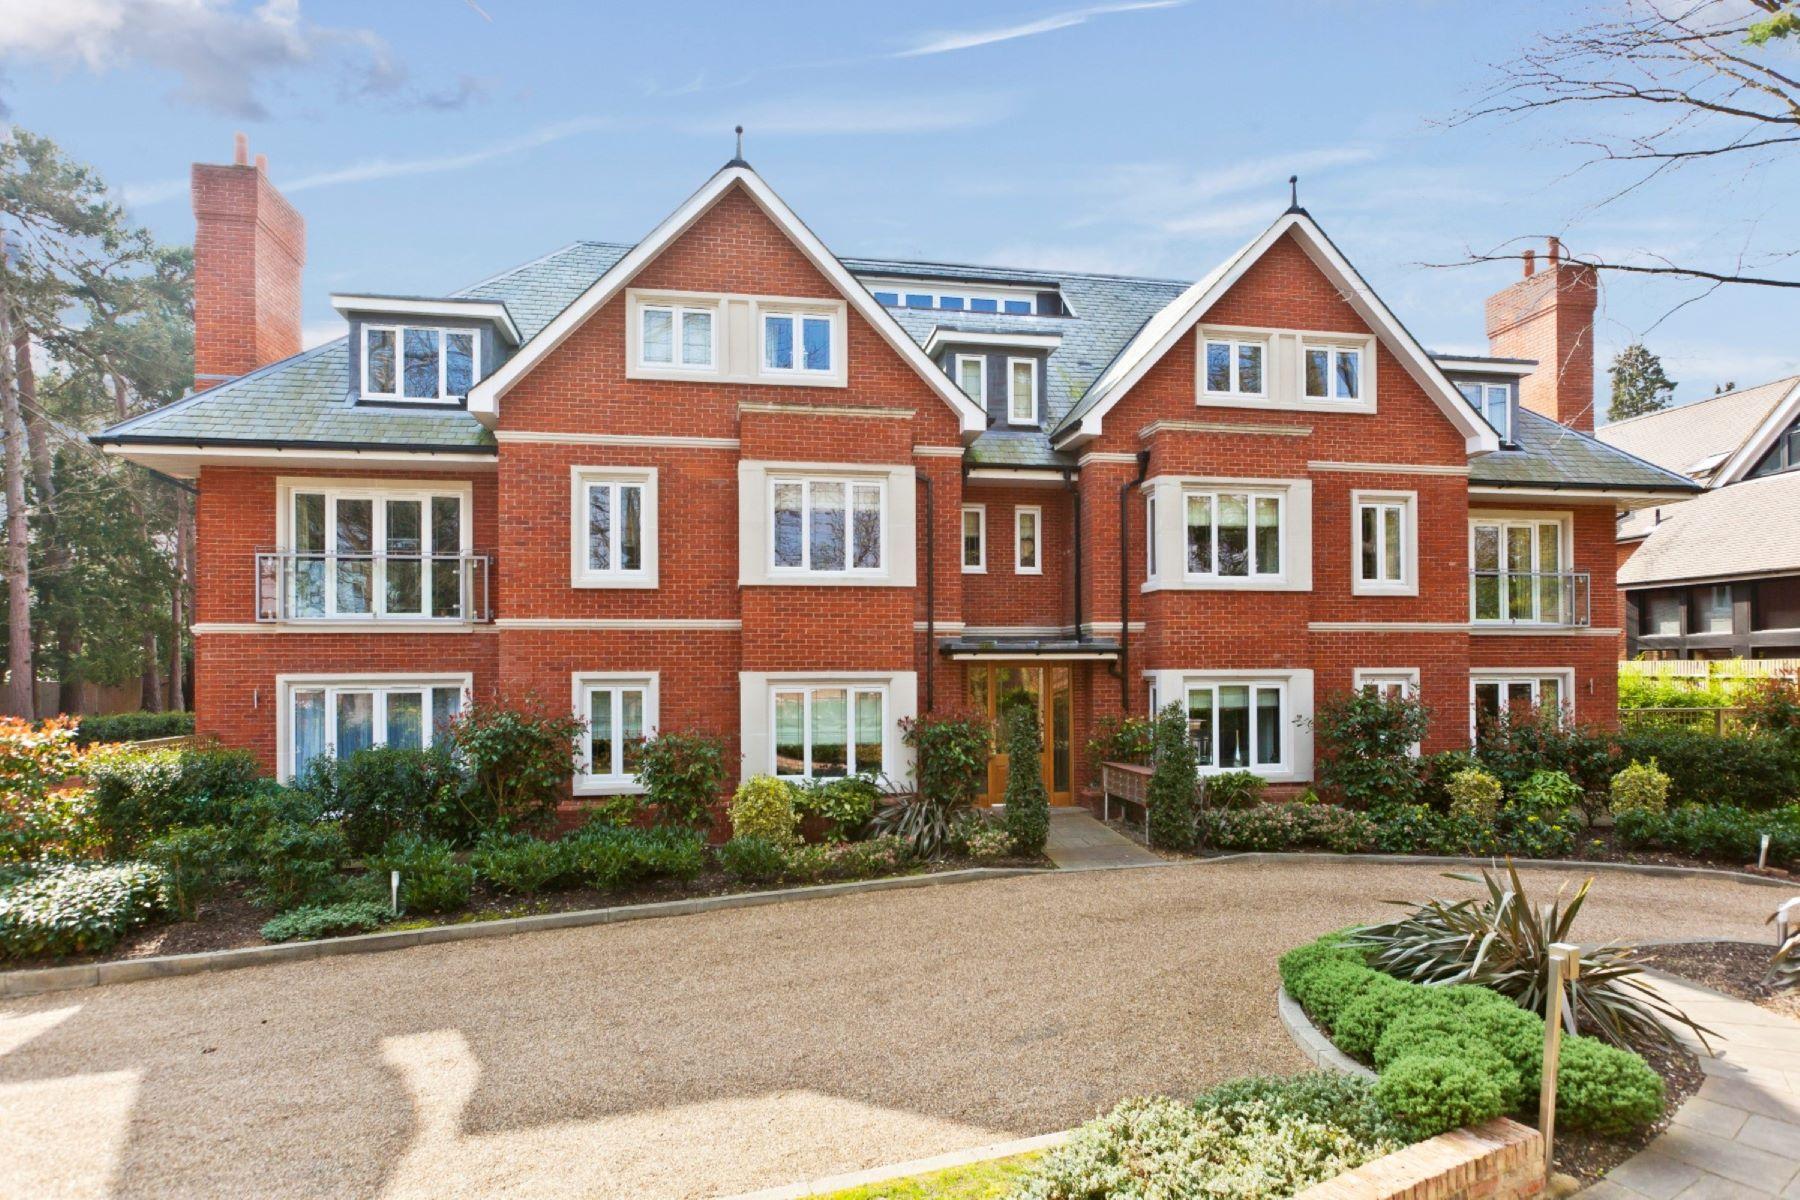 شقة للـ Sale في Weybridge, Surrey Weybridge, England, United Kingdom